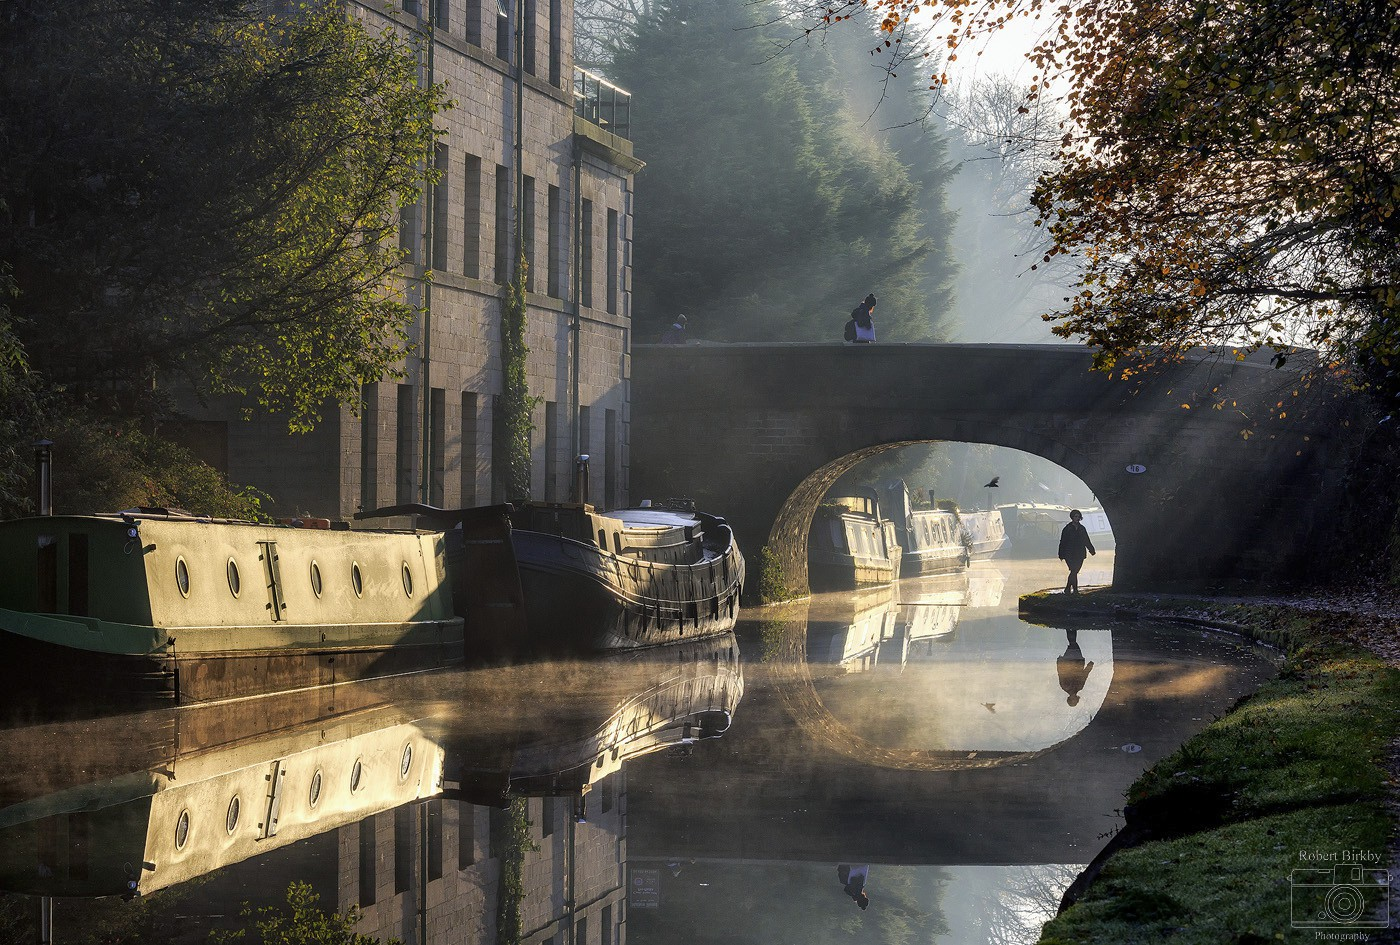 Canal Commuters - Recent uploads